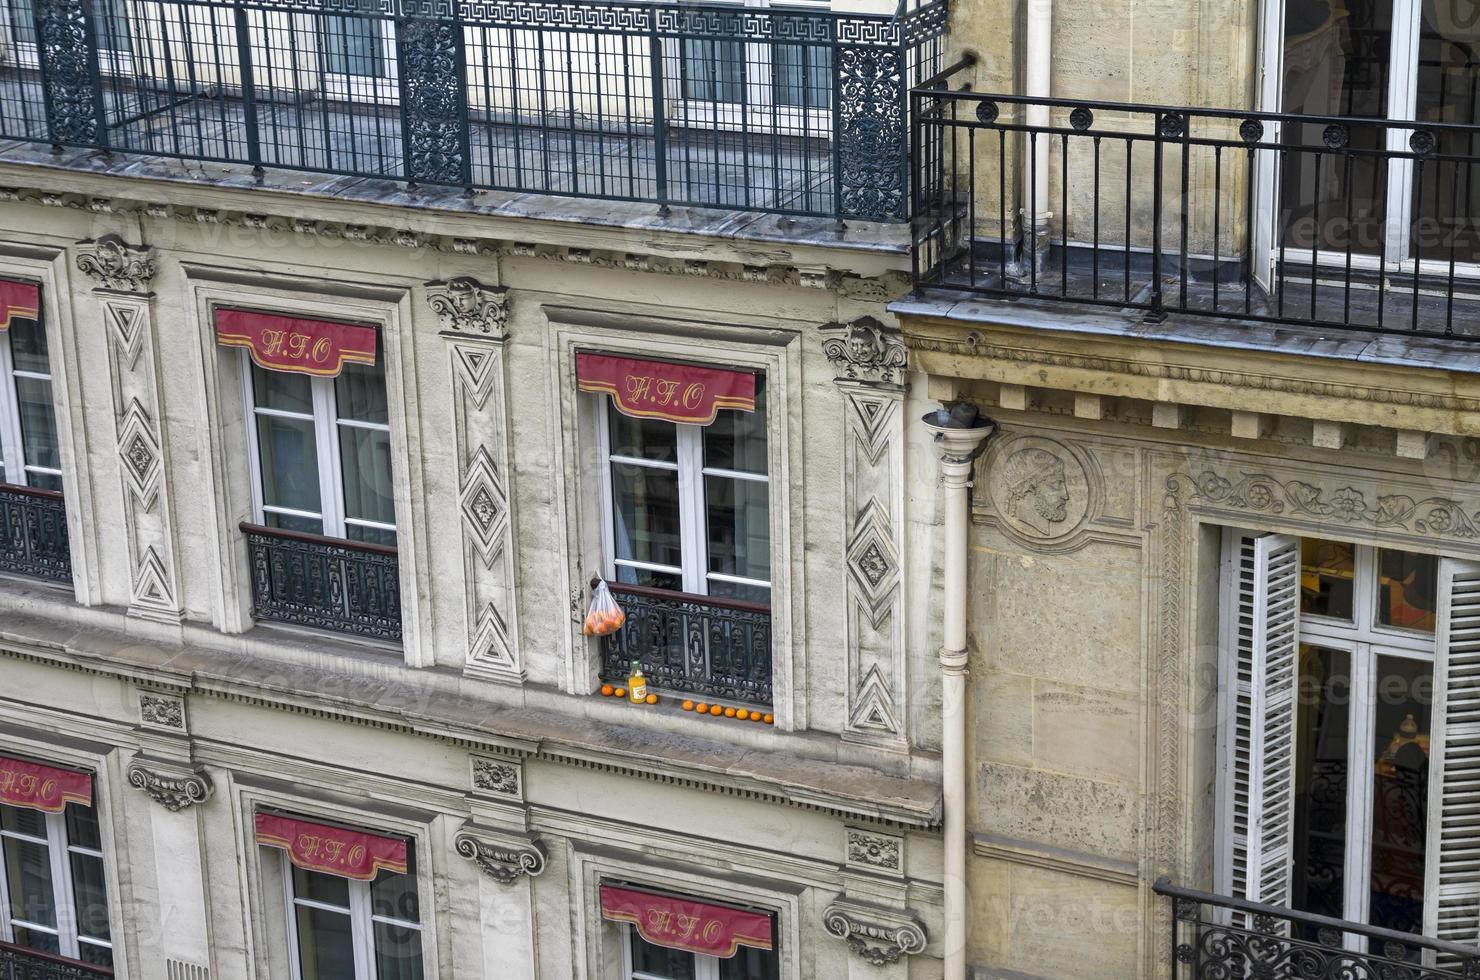 tangerinas no peitoril da janela. foto